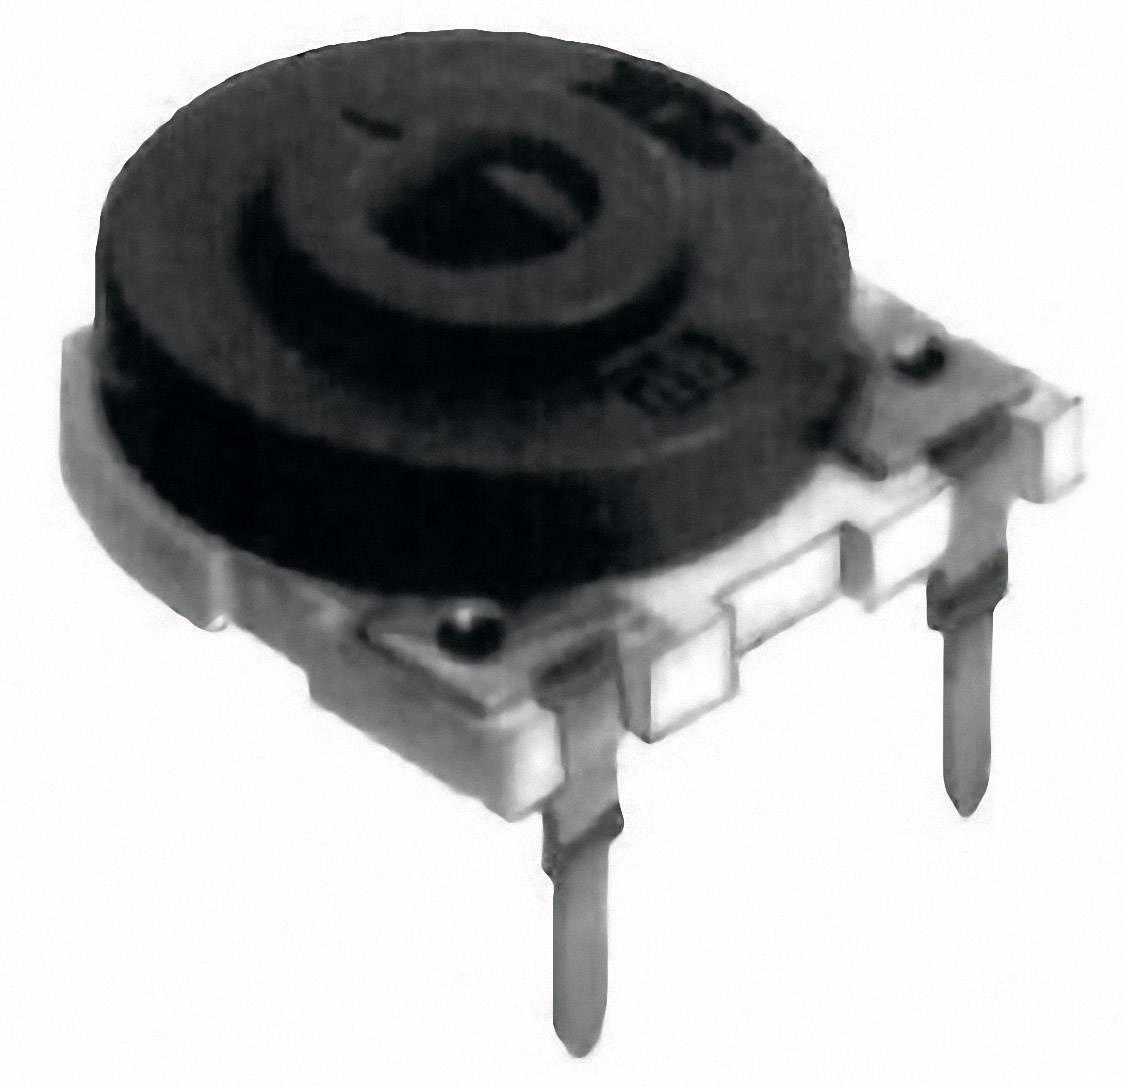 Cermetový trimer TT Electro, 2041461705, 22 kΩ, 0.5 W, ± 20%